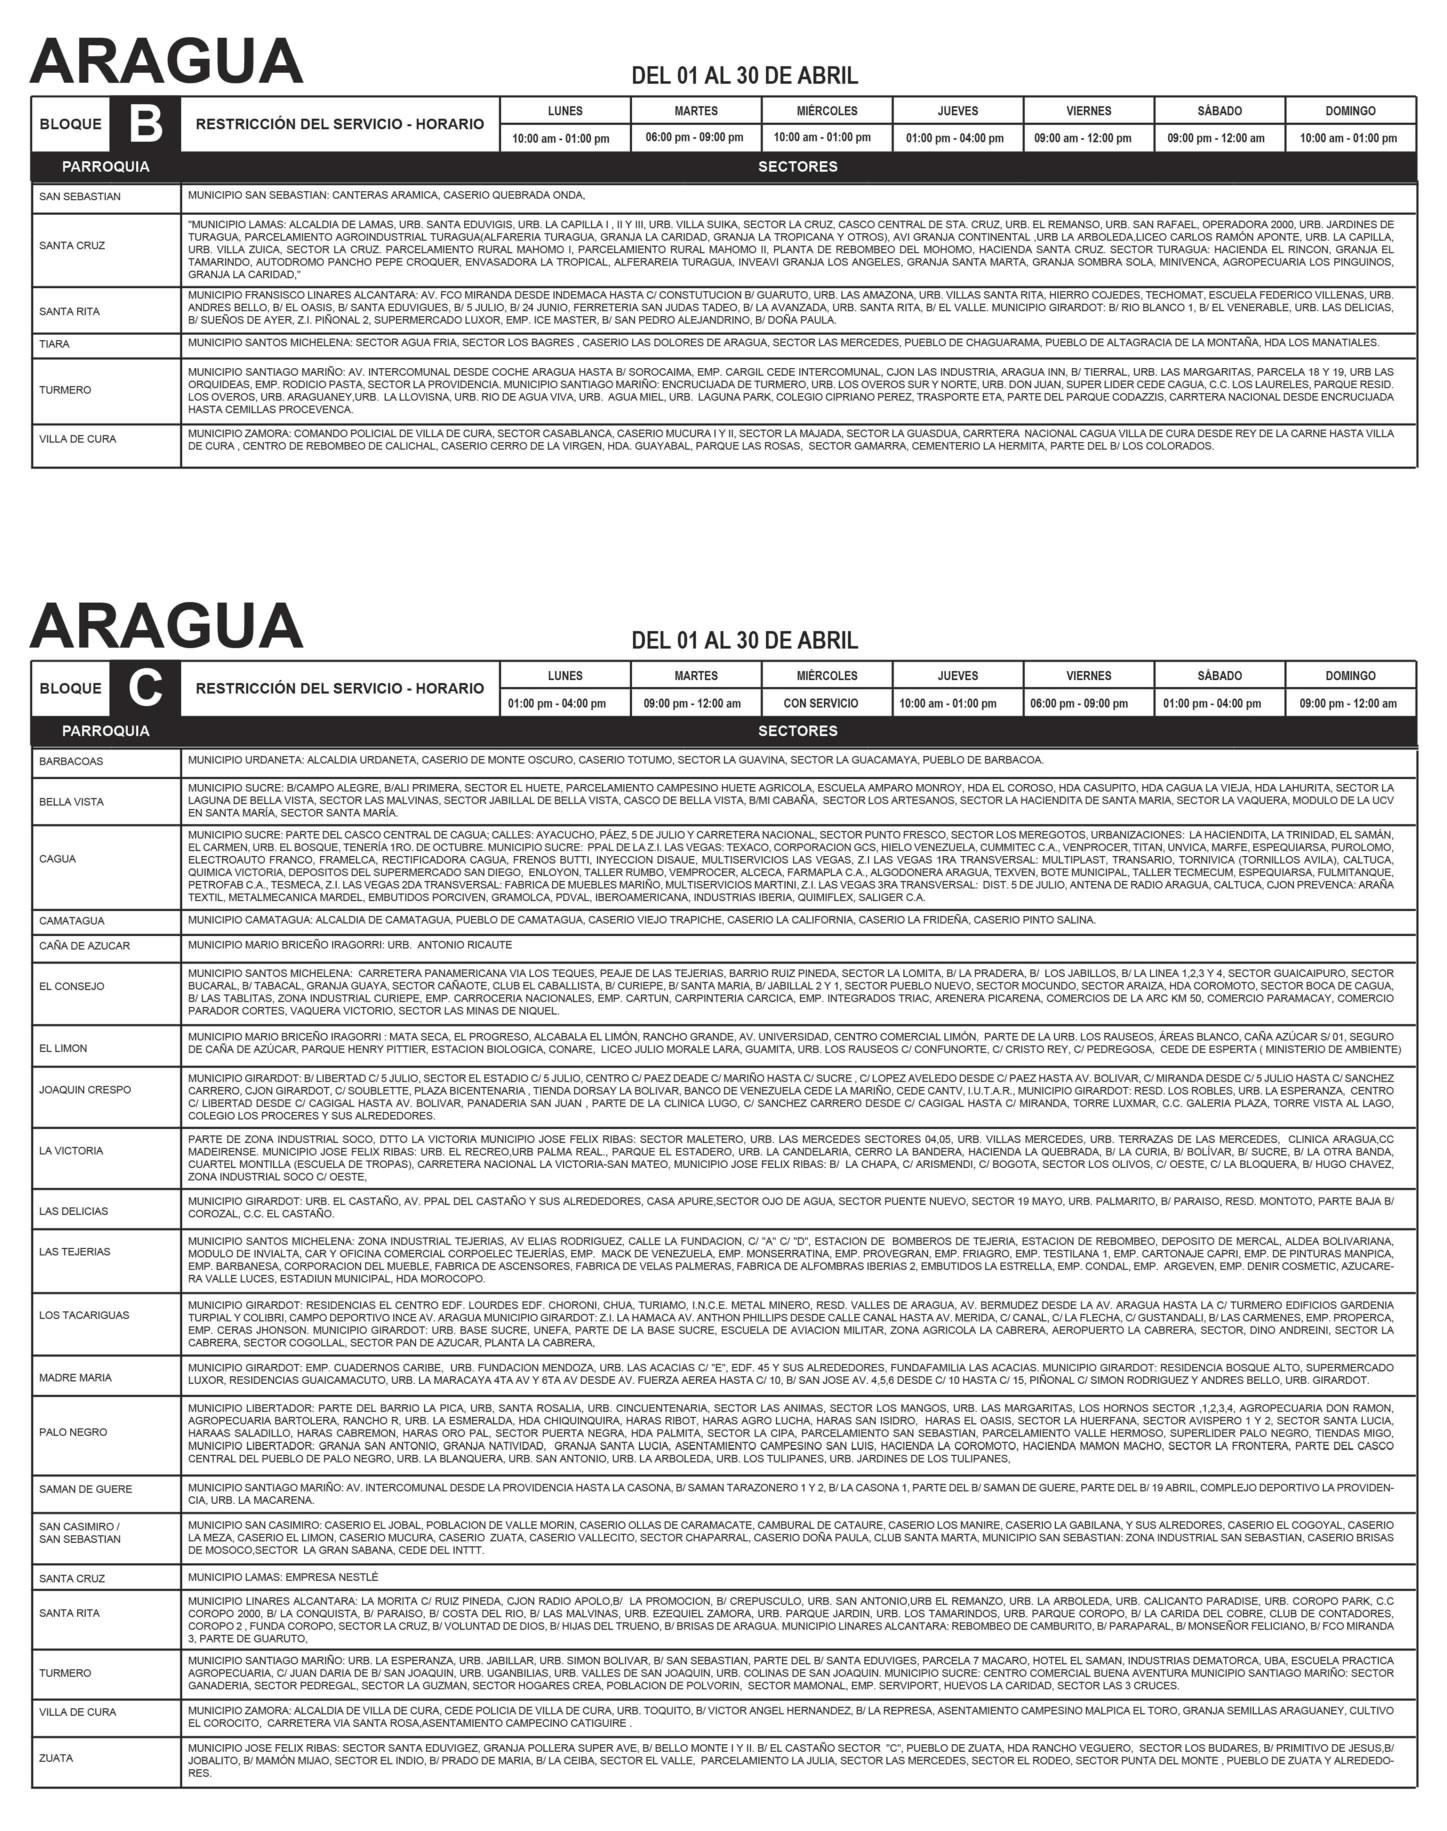 Aragua cronograma oficial de racionamiento de corpoelec for Cronograma de racionamiento de luz en aragua